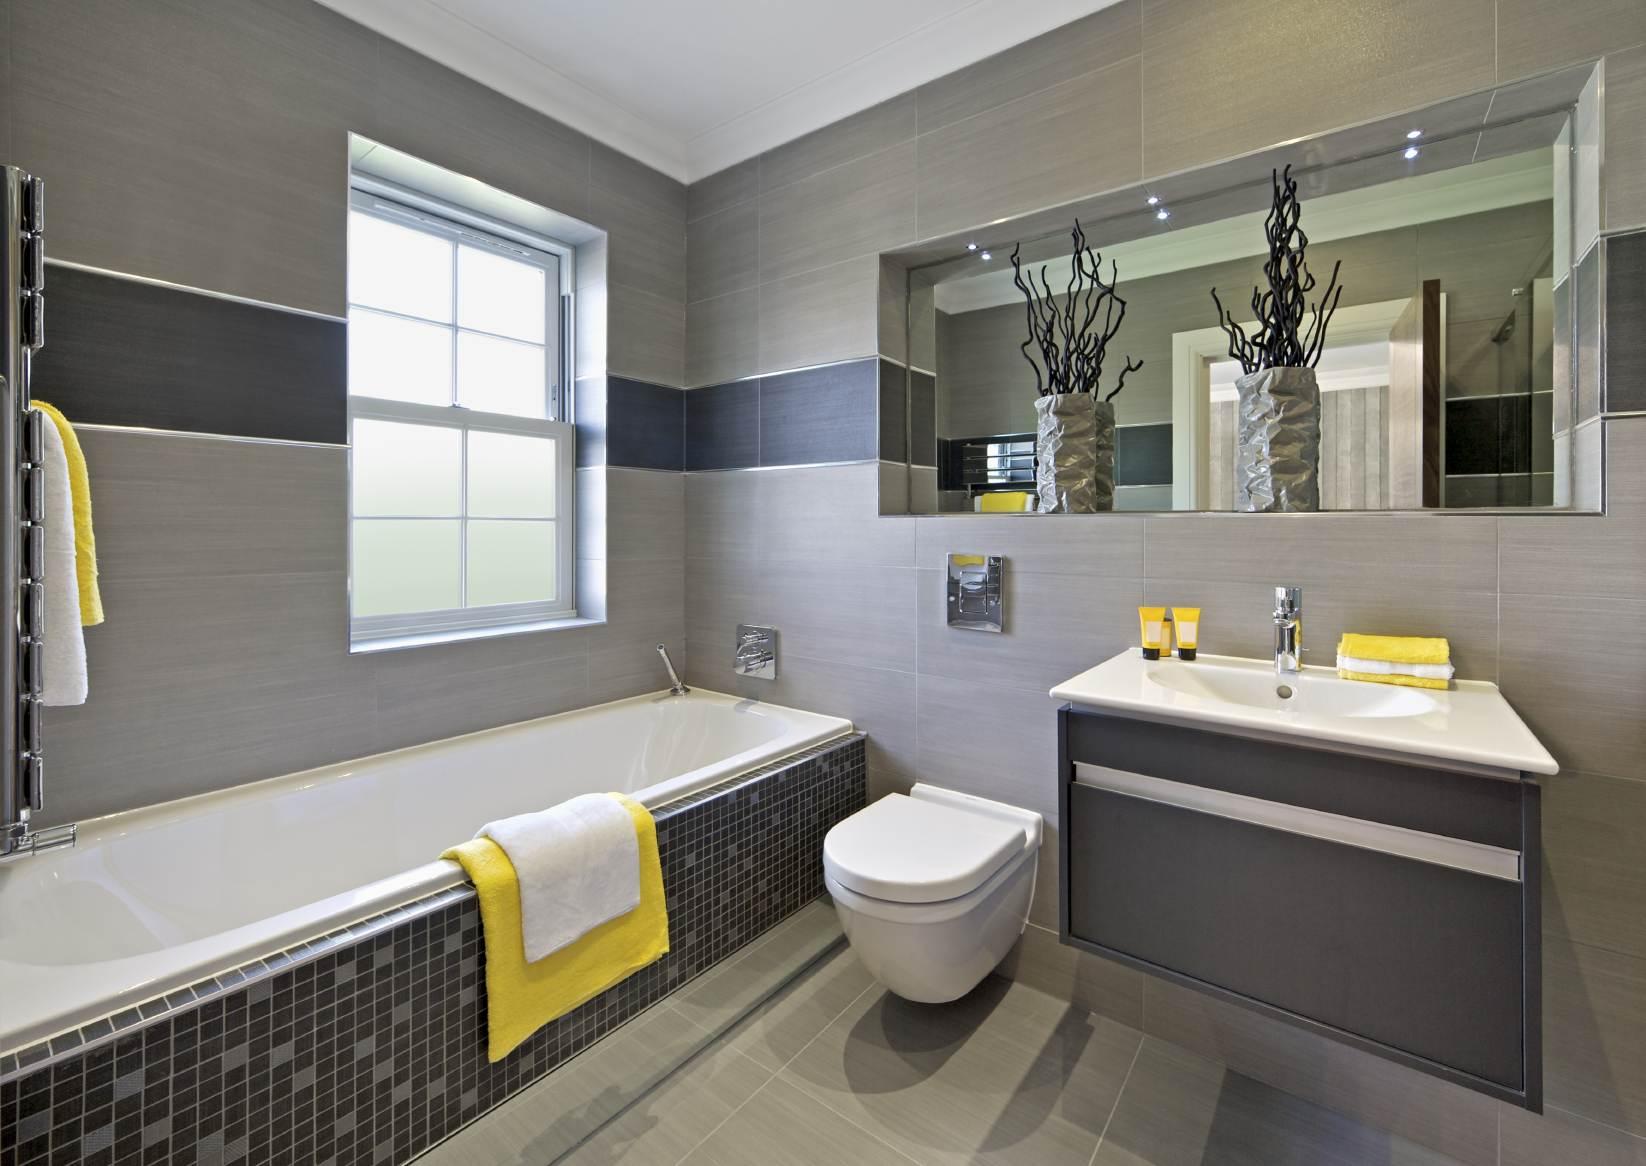 Salle de bains aide au choix budget type infos - Amenager sa salle de bain ...